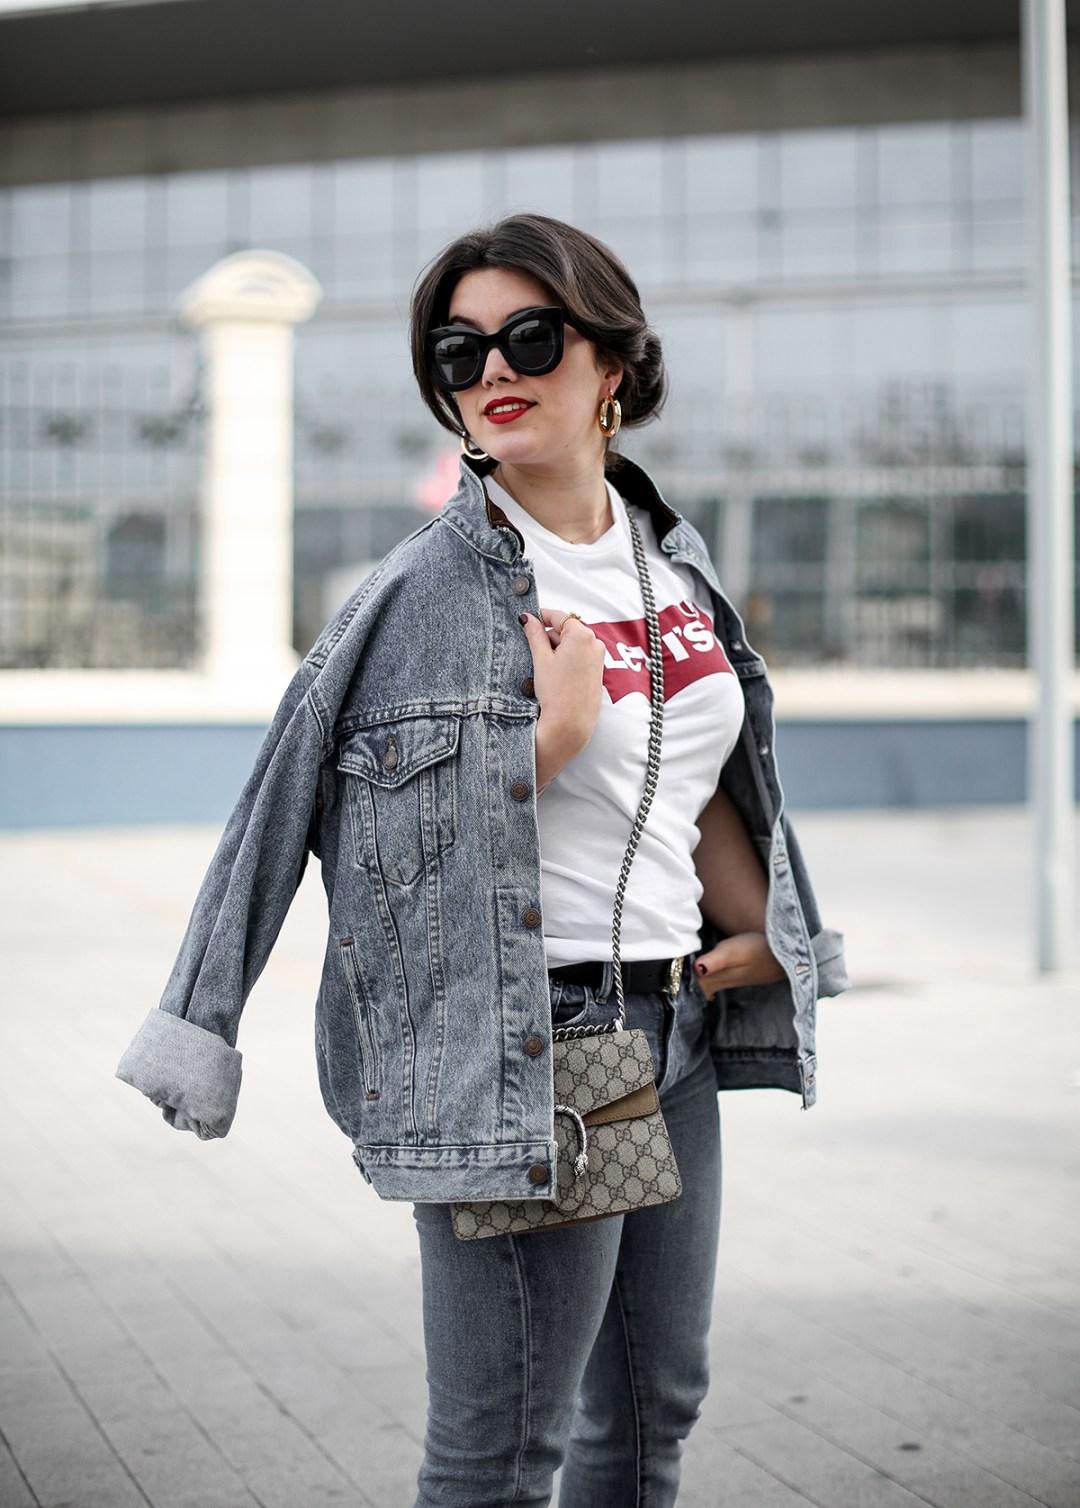 denim-total-look-levis-girl-vintage-gucci-horsebit-shoes-dionysus-bag11